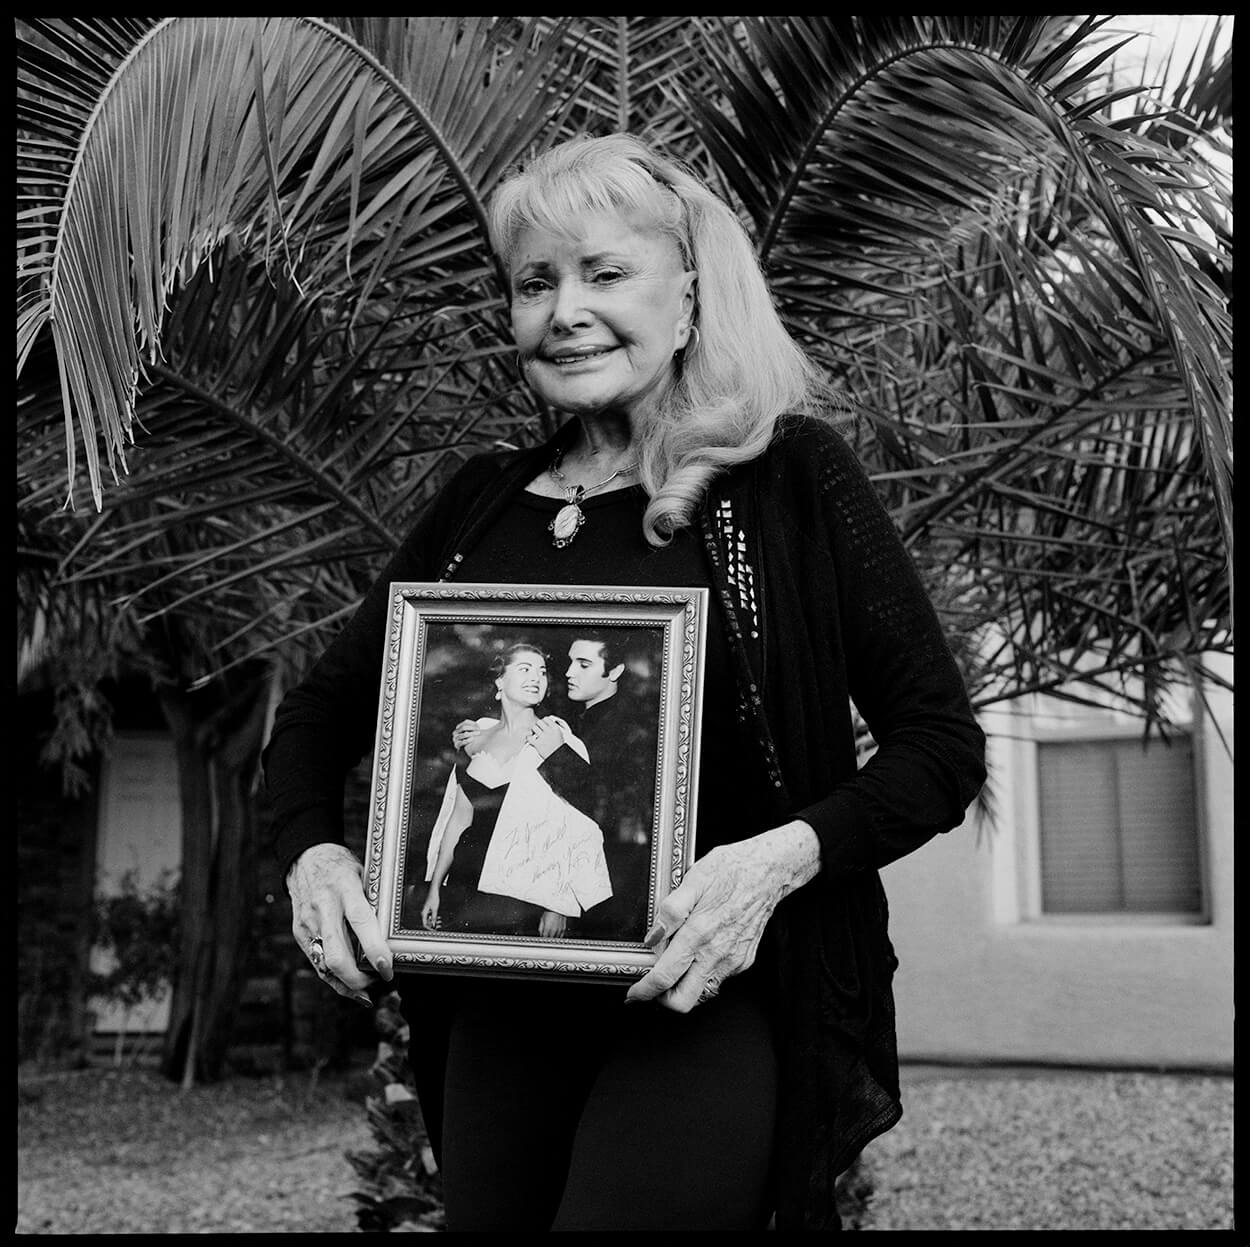 Joanie Shoofey / Las Vegas Socialite - Off The Strip - Hunter Barnes Photography